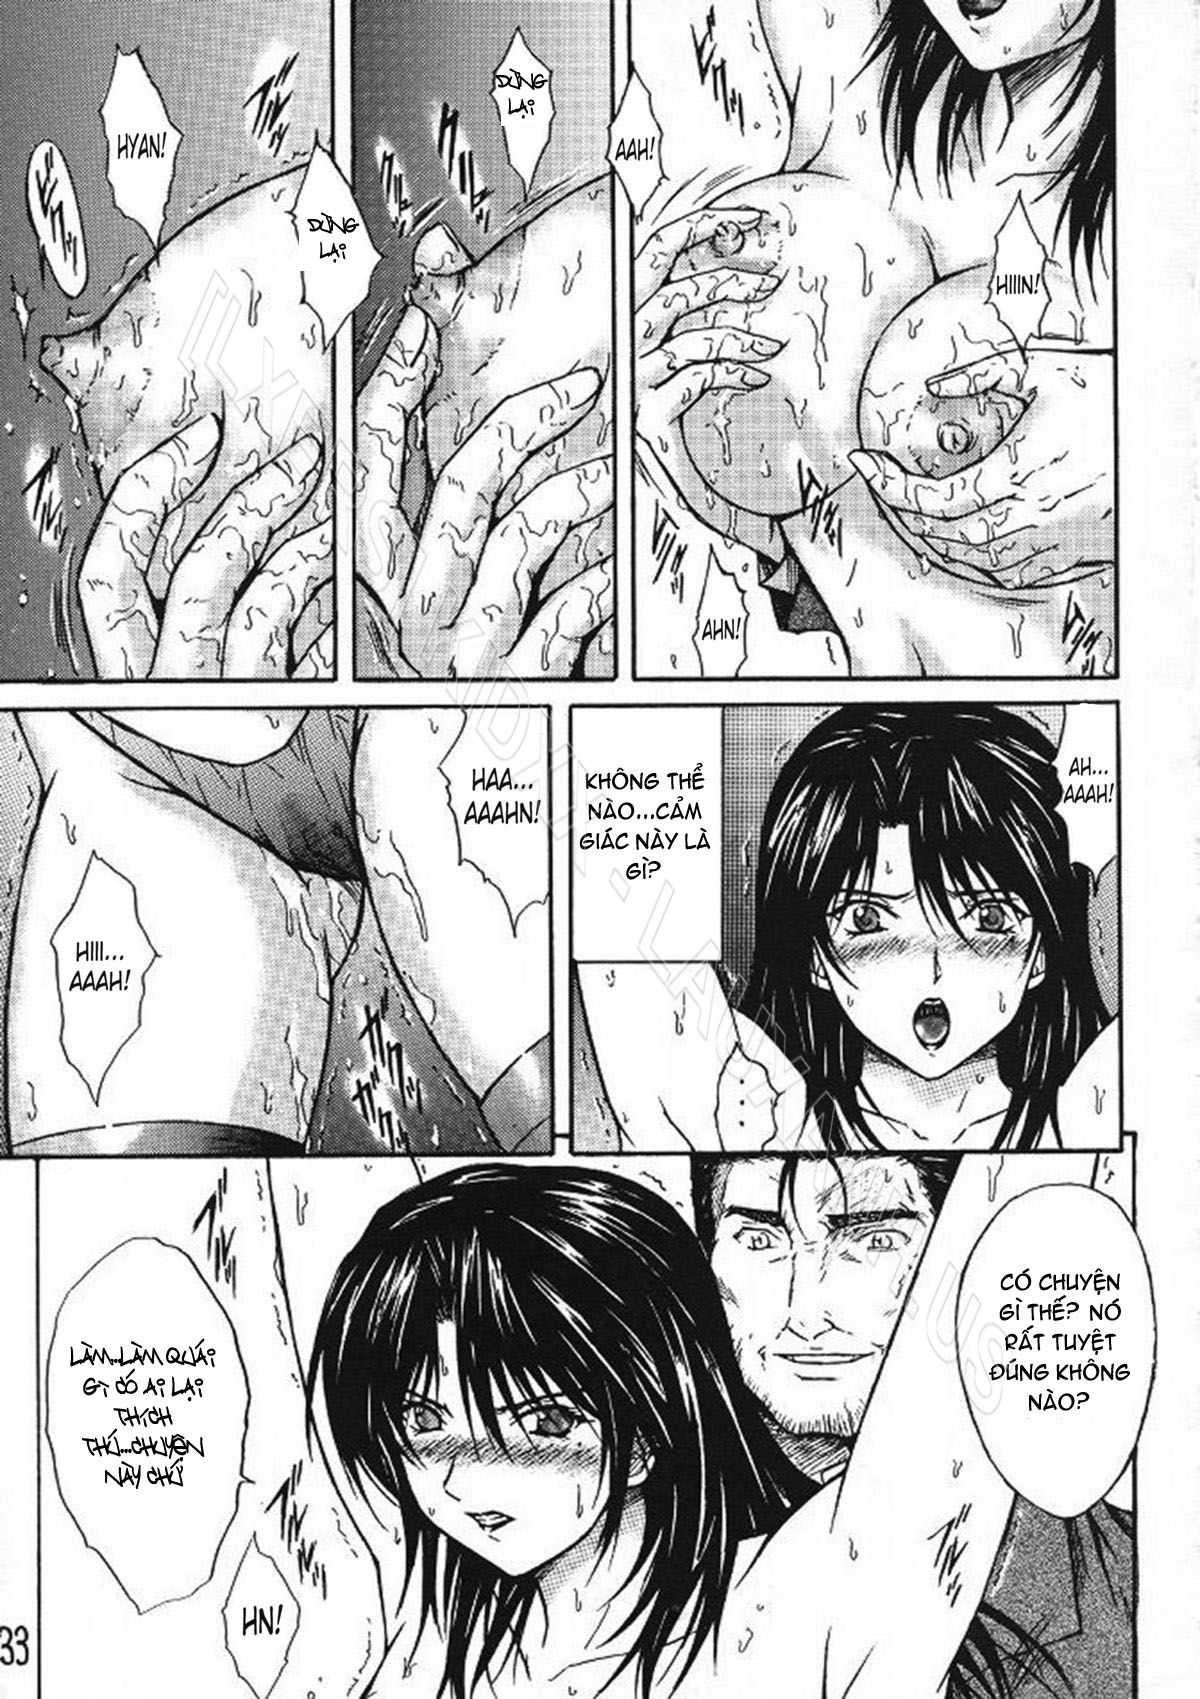 TruyenHay.Com - Ảnh 32 - Ryoujoku Rensa Chapter 2